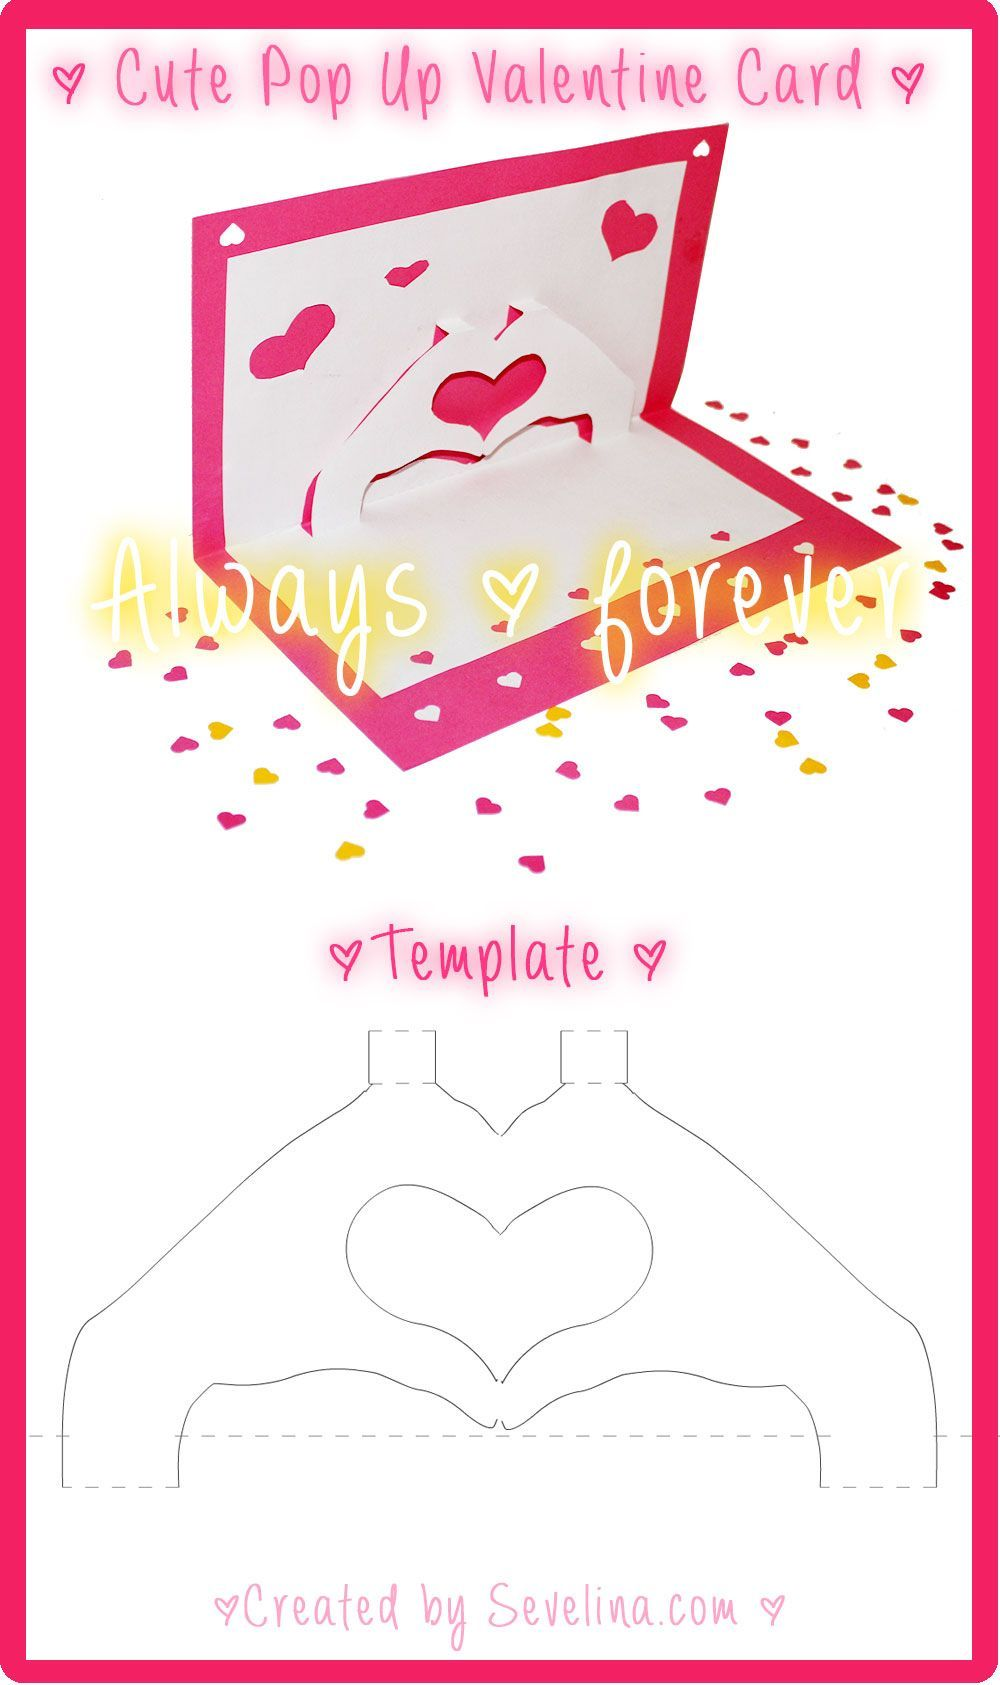 pop up card templatessami prints on templates  pop